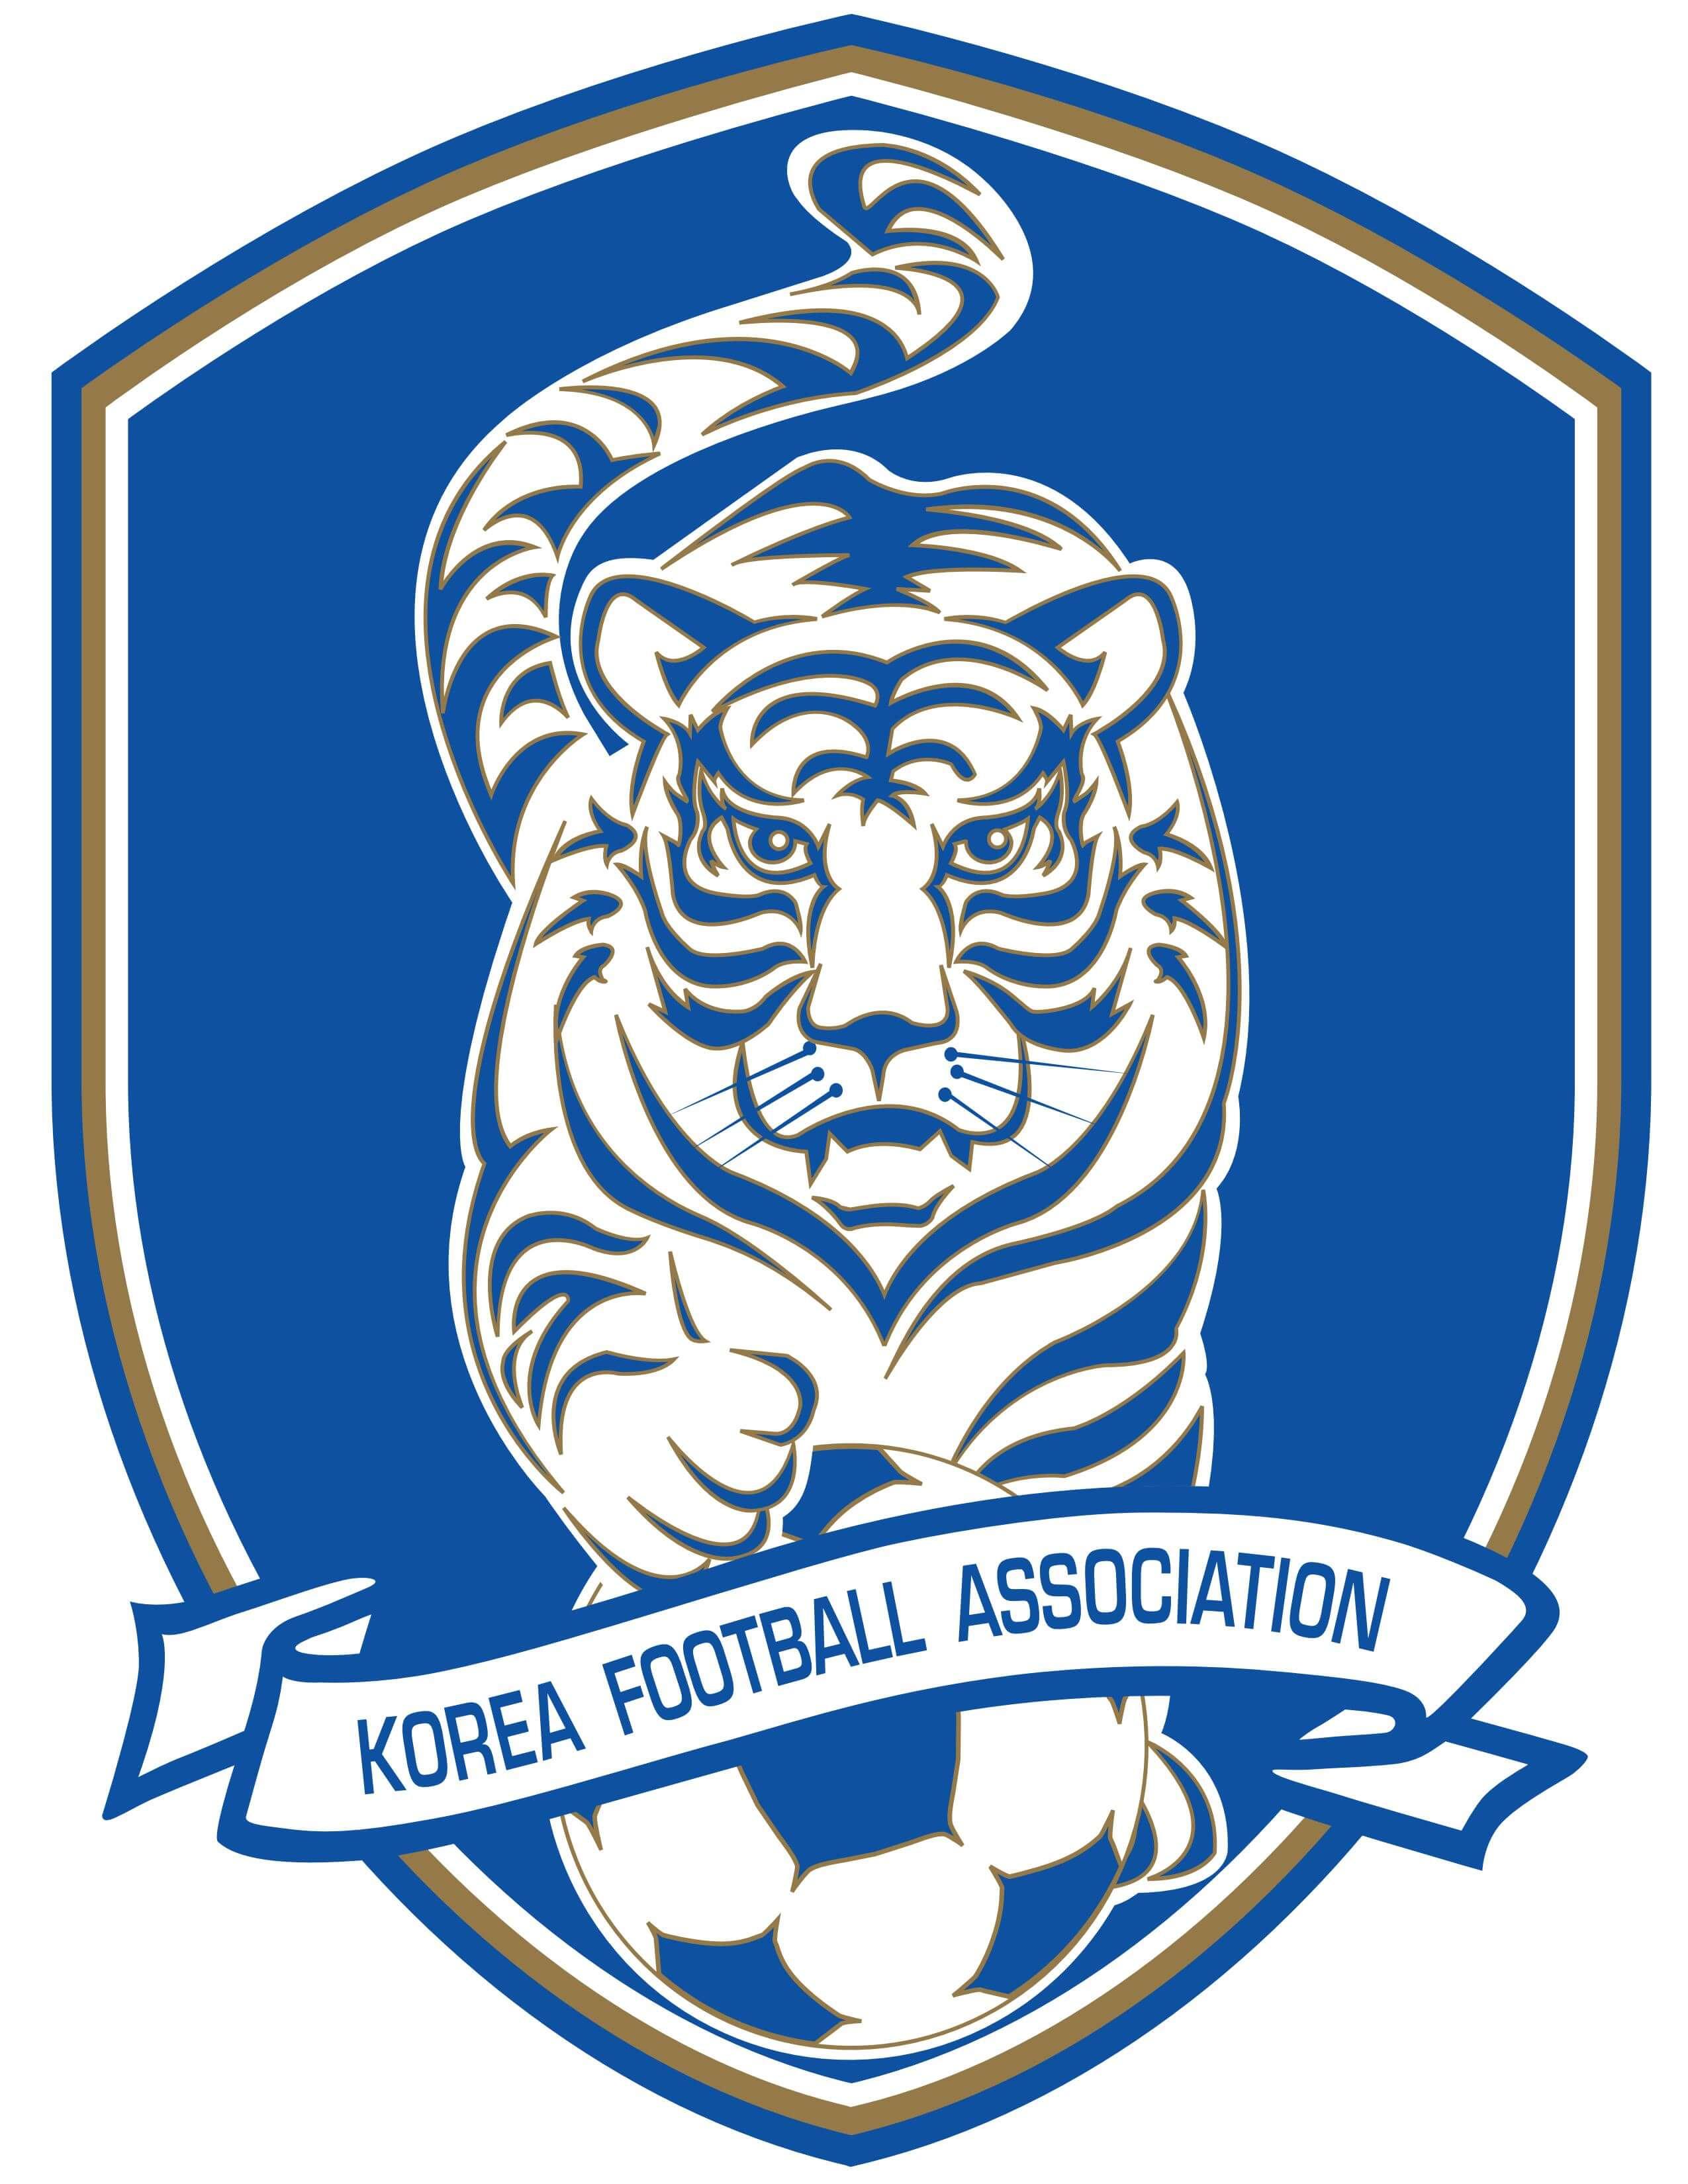 korea-football-association-south-korea-national-football-team-logo